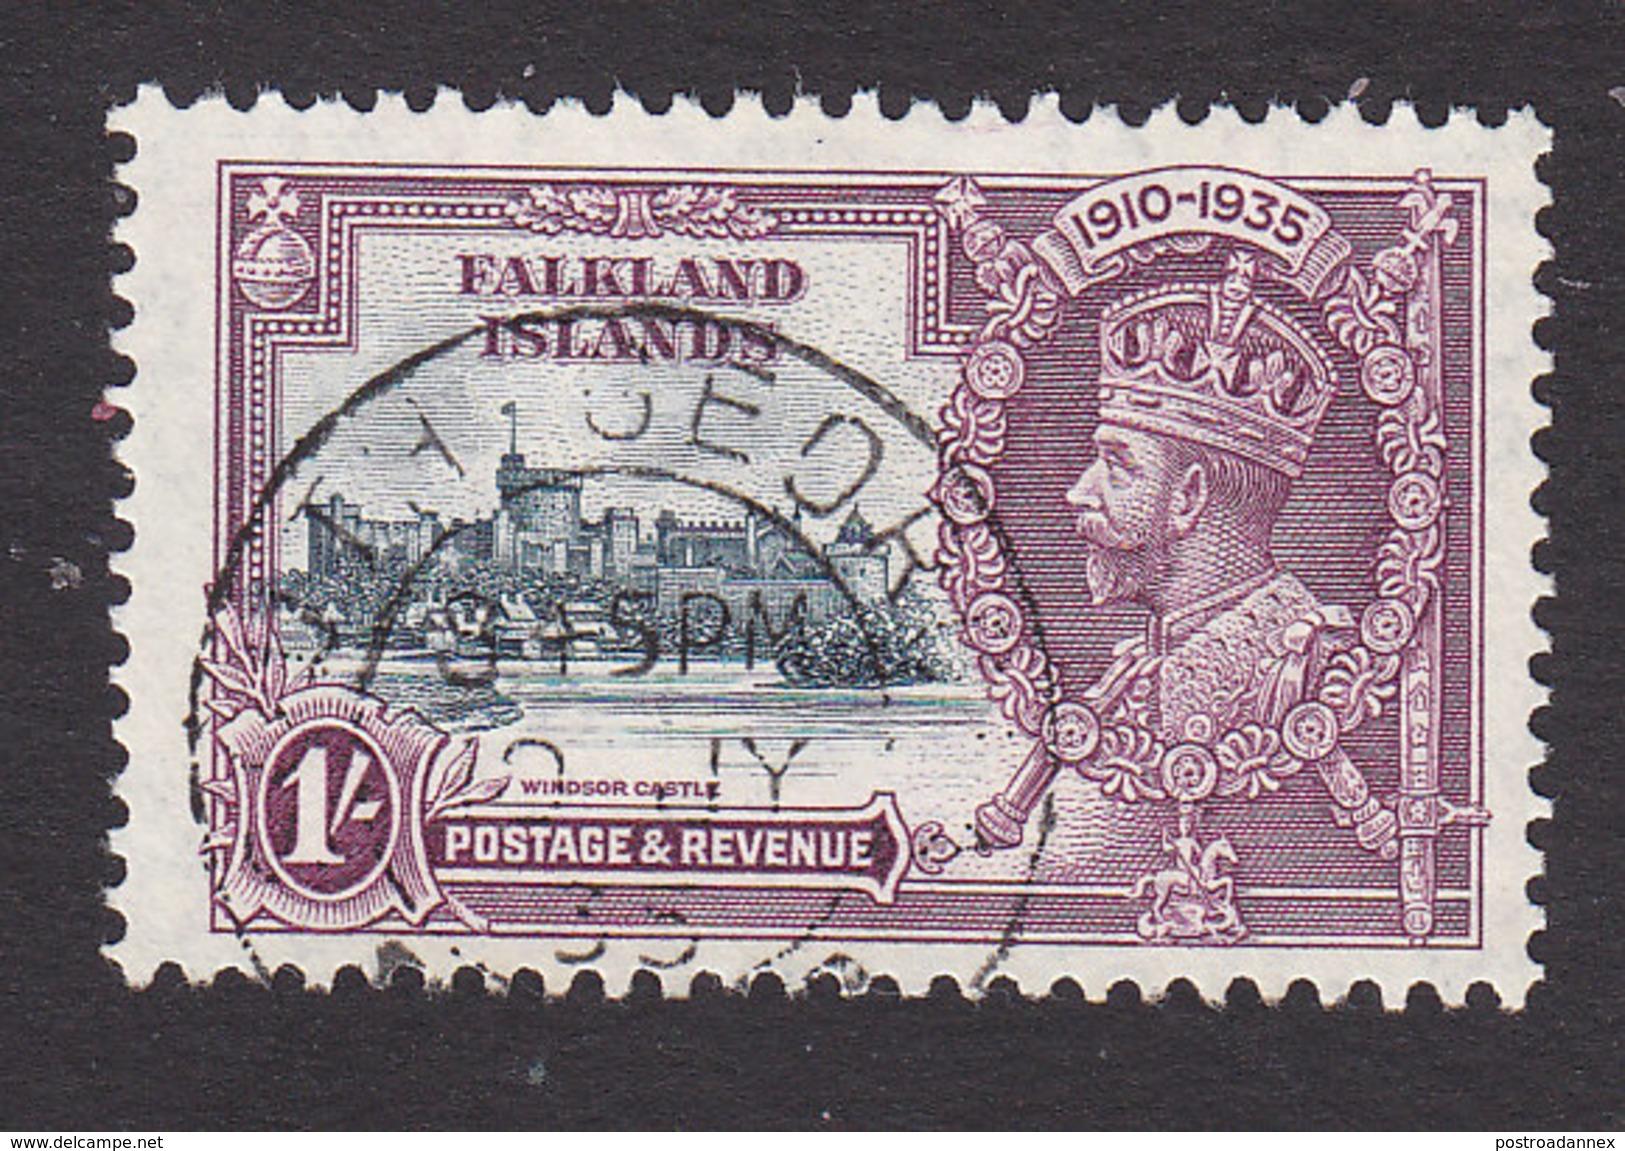 Falkland Islands, Scott #80, Used, Silver Jubilee, Issued 1935 - Falkland Islands